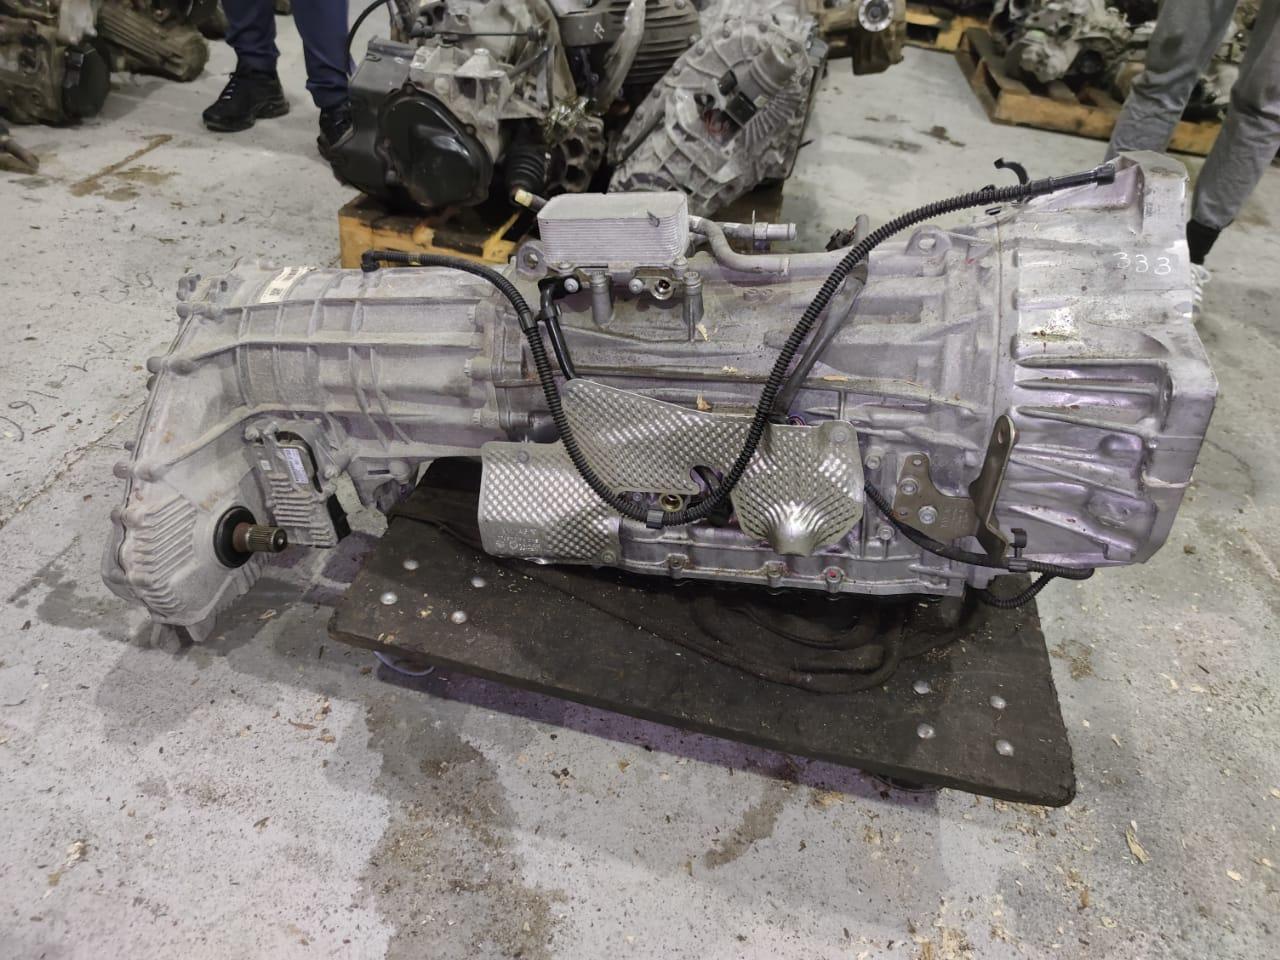 6-ст АКПП  EXT, Porsche Cayenne,  M55.02 MCE.YA, 3.6, 4WD, 2003-